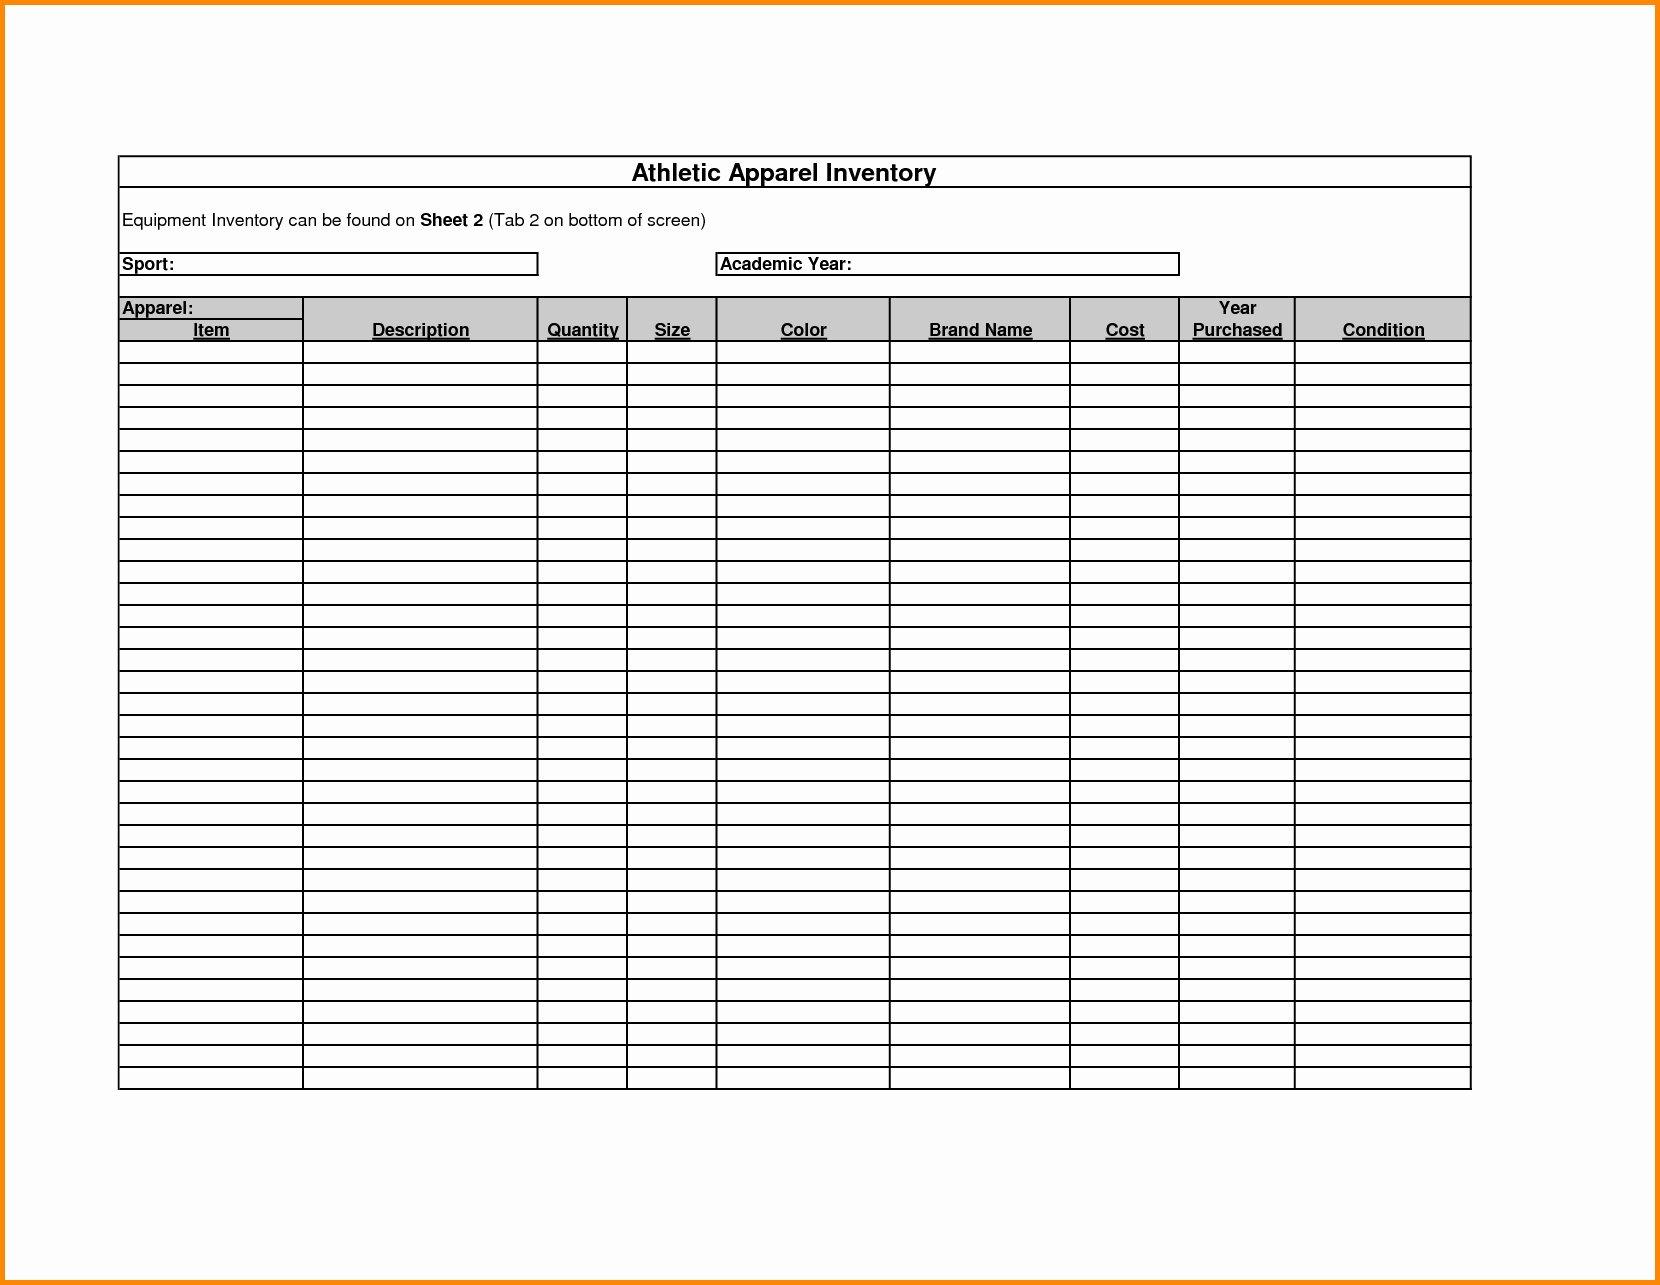 Inventory Worksheet Template Excel Inspirational Basiccontrol Free Excel Inventory Templatesl Business